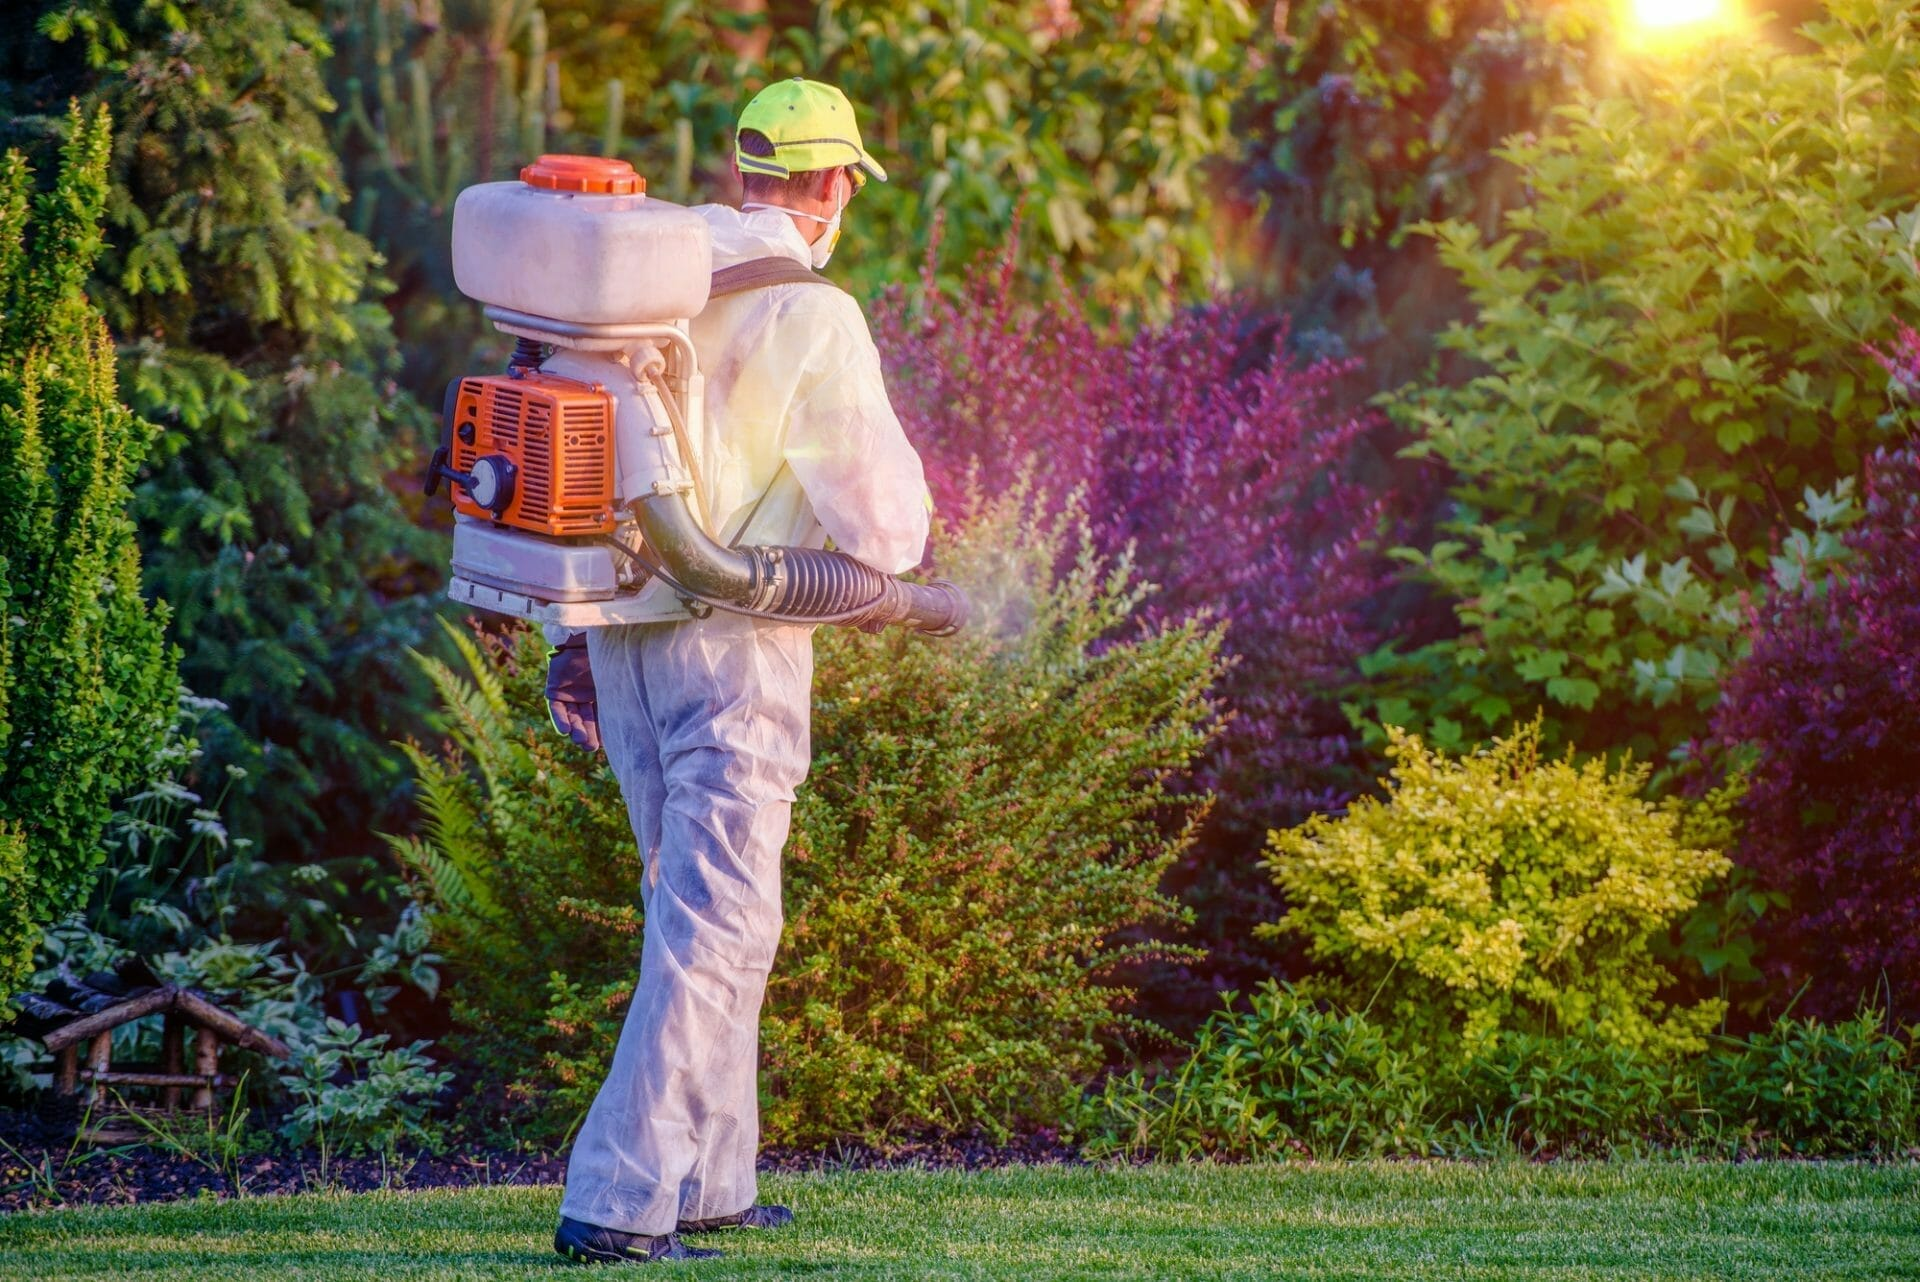 Man Spraying for pest control